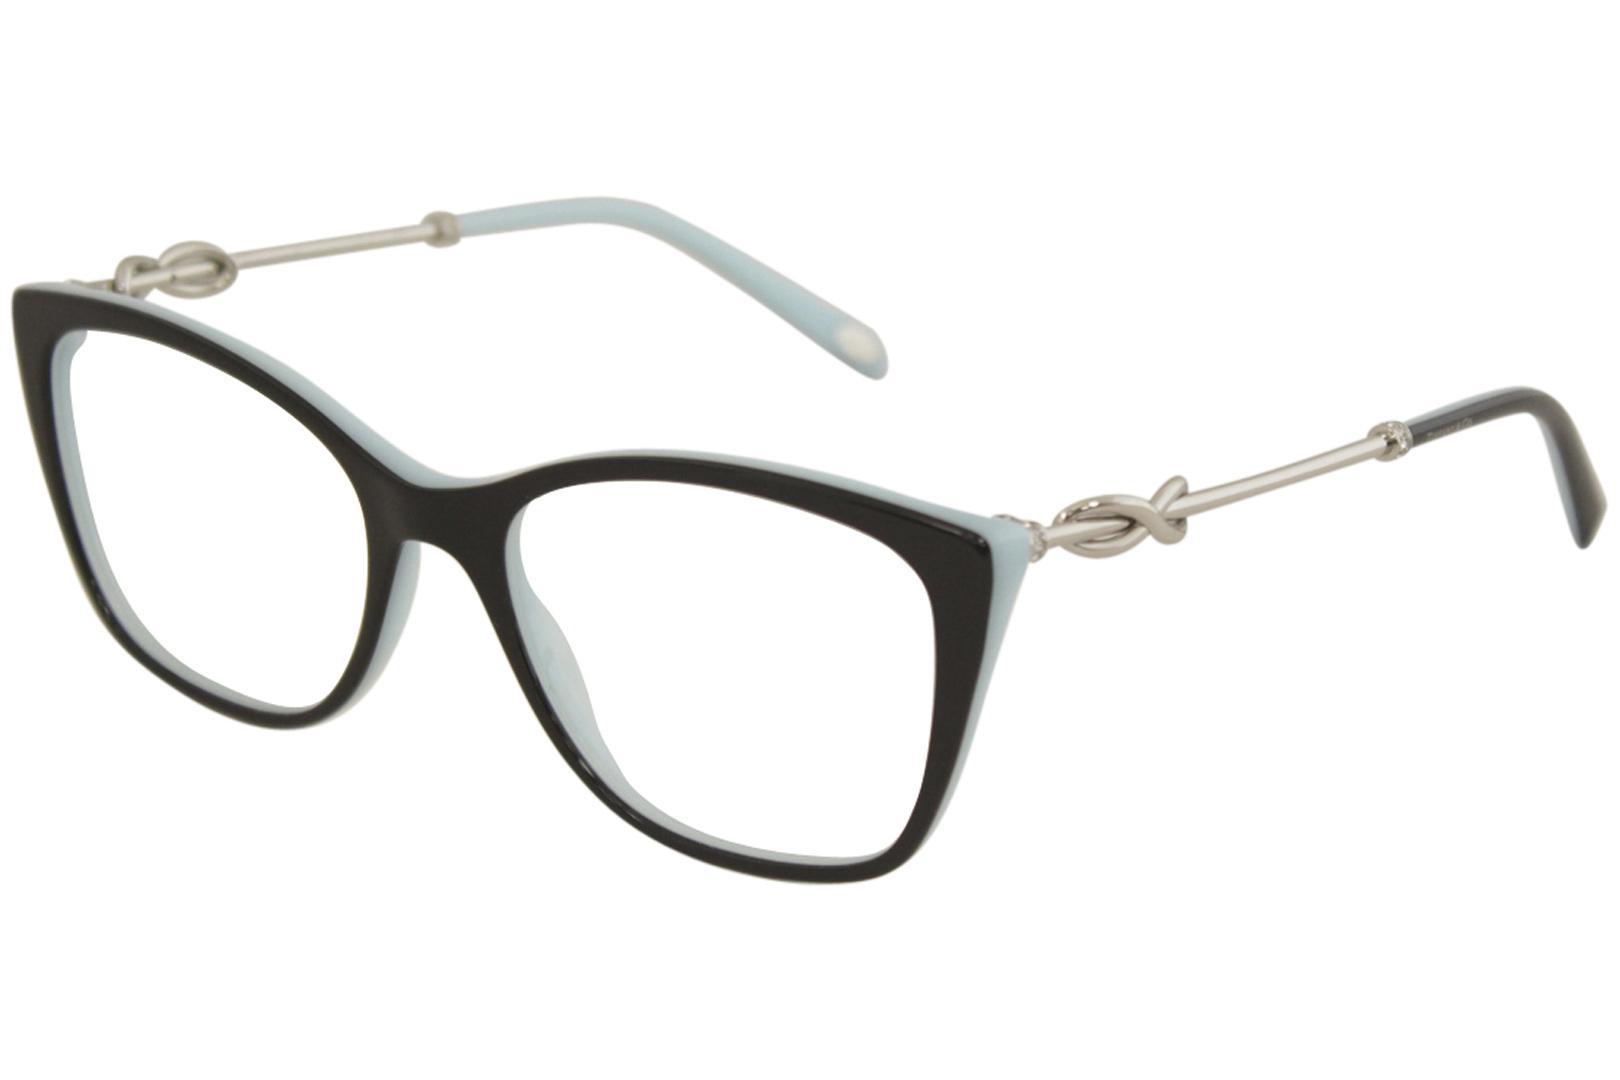 e8be88dcae2 Tiffany   Co. Women s Eyeglasses TF2160B TF 2160 B Full Rim Optical ...